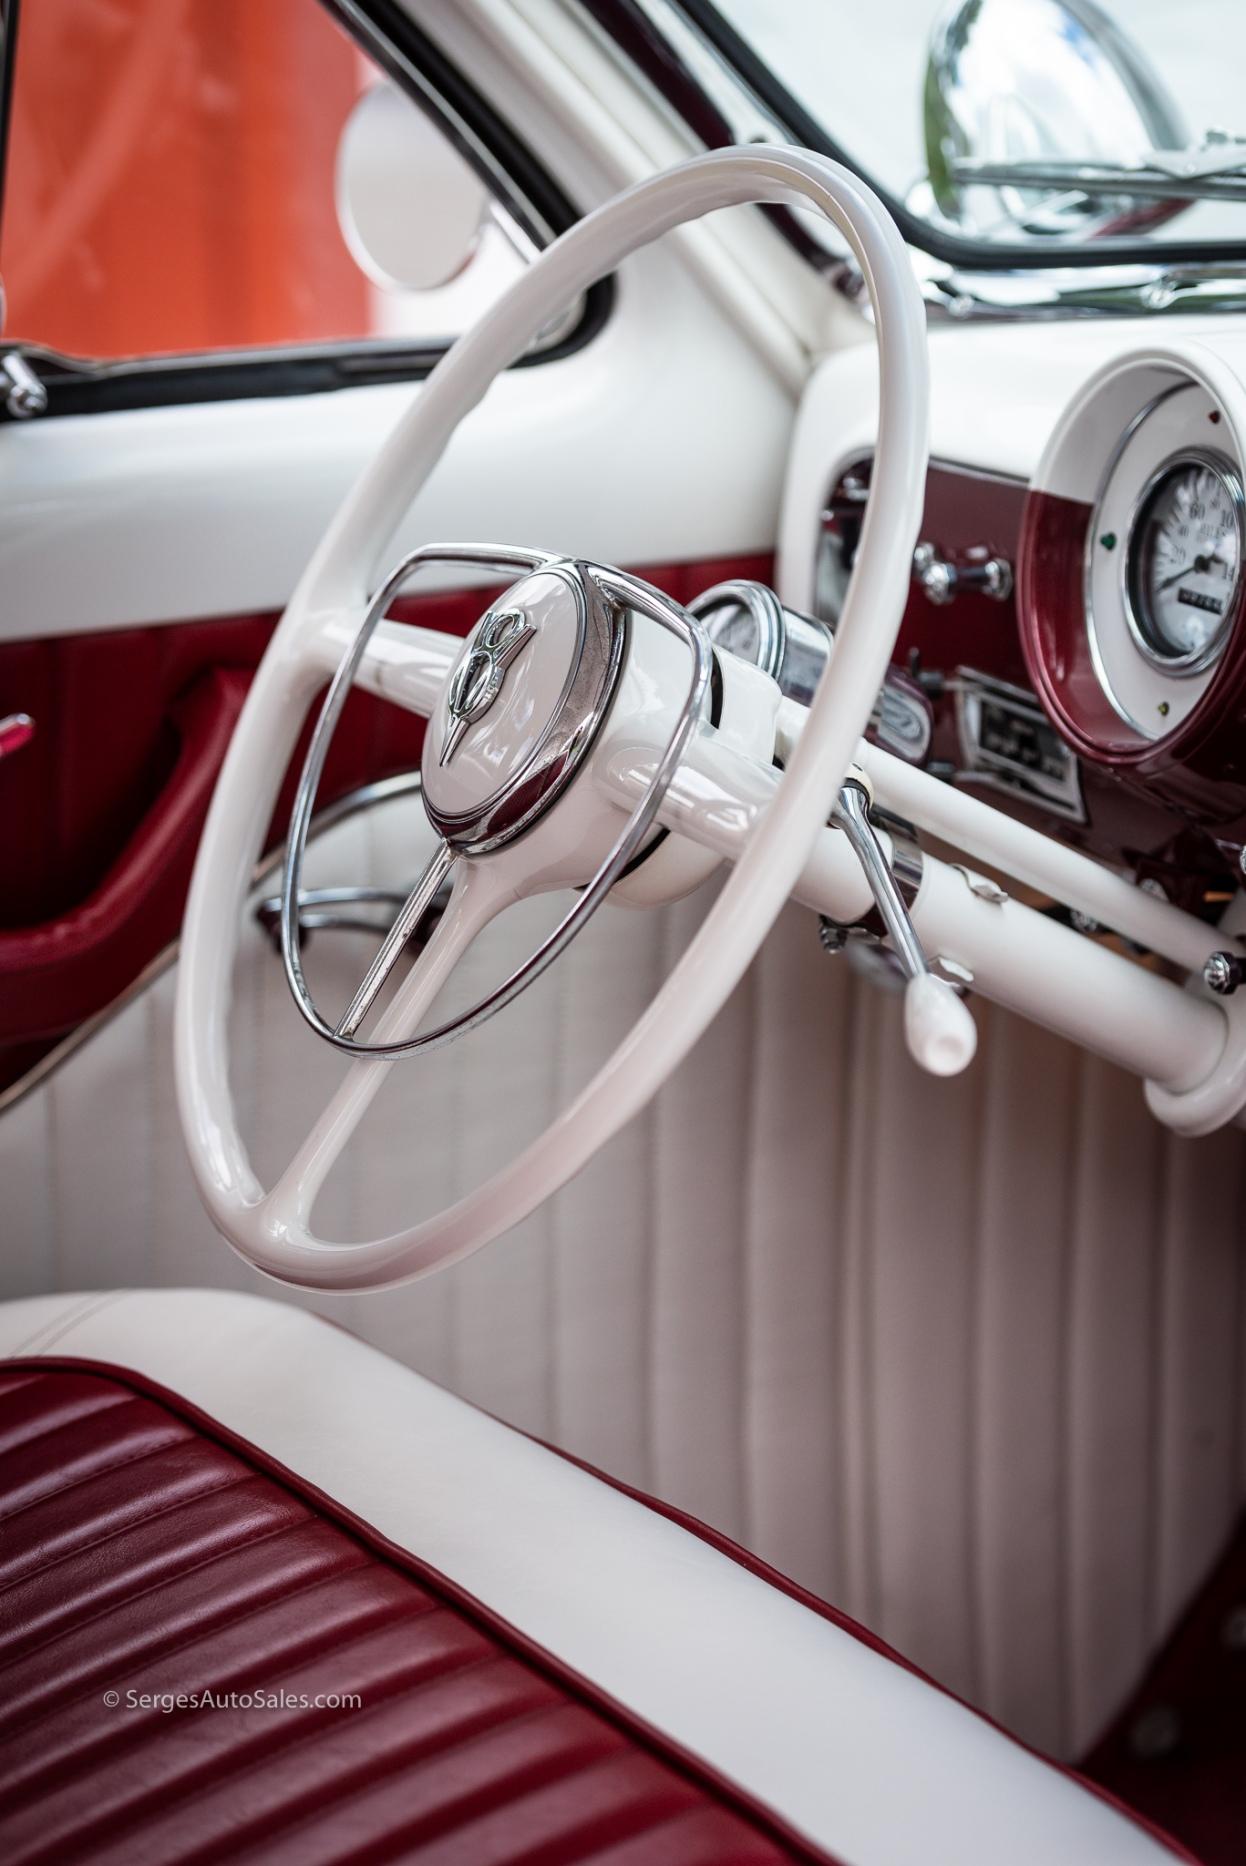 1950-ford-custom-for-sale-serges-auto-sales-pennsylvania-car-dealer-classics-customs-muscle-brokering-53